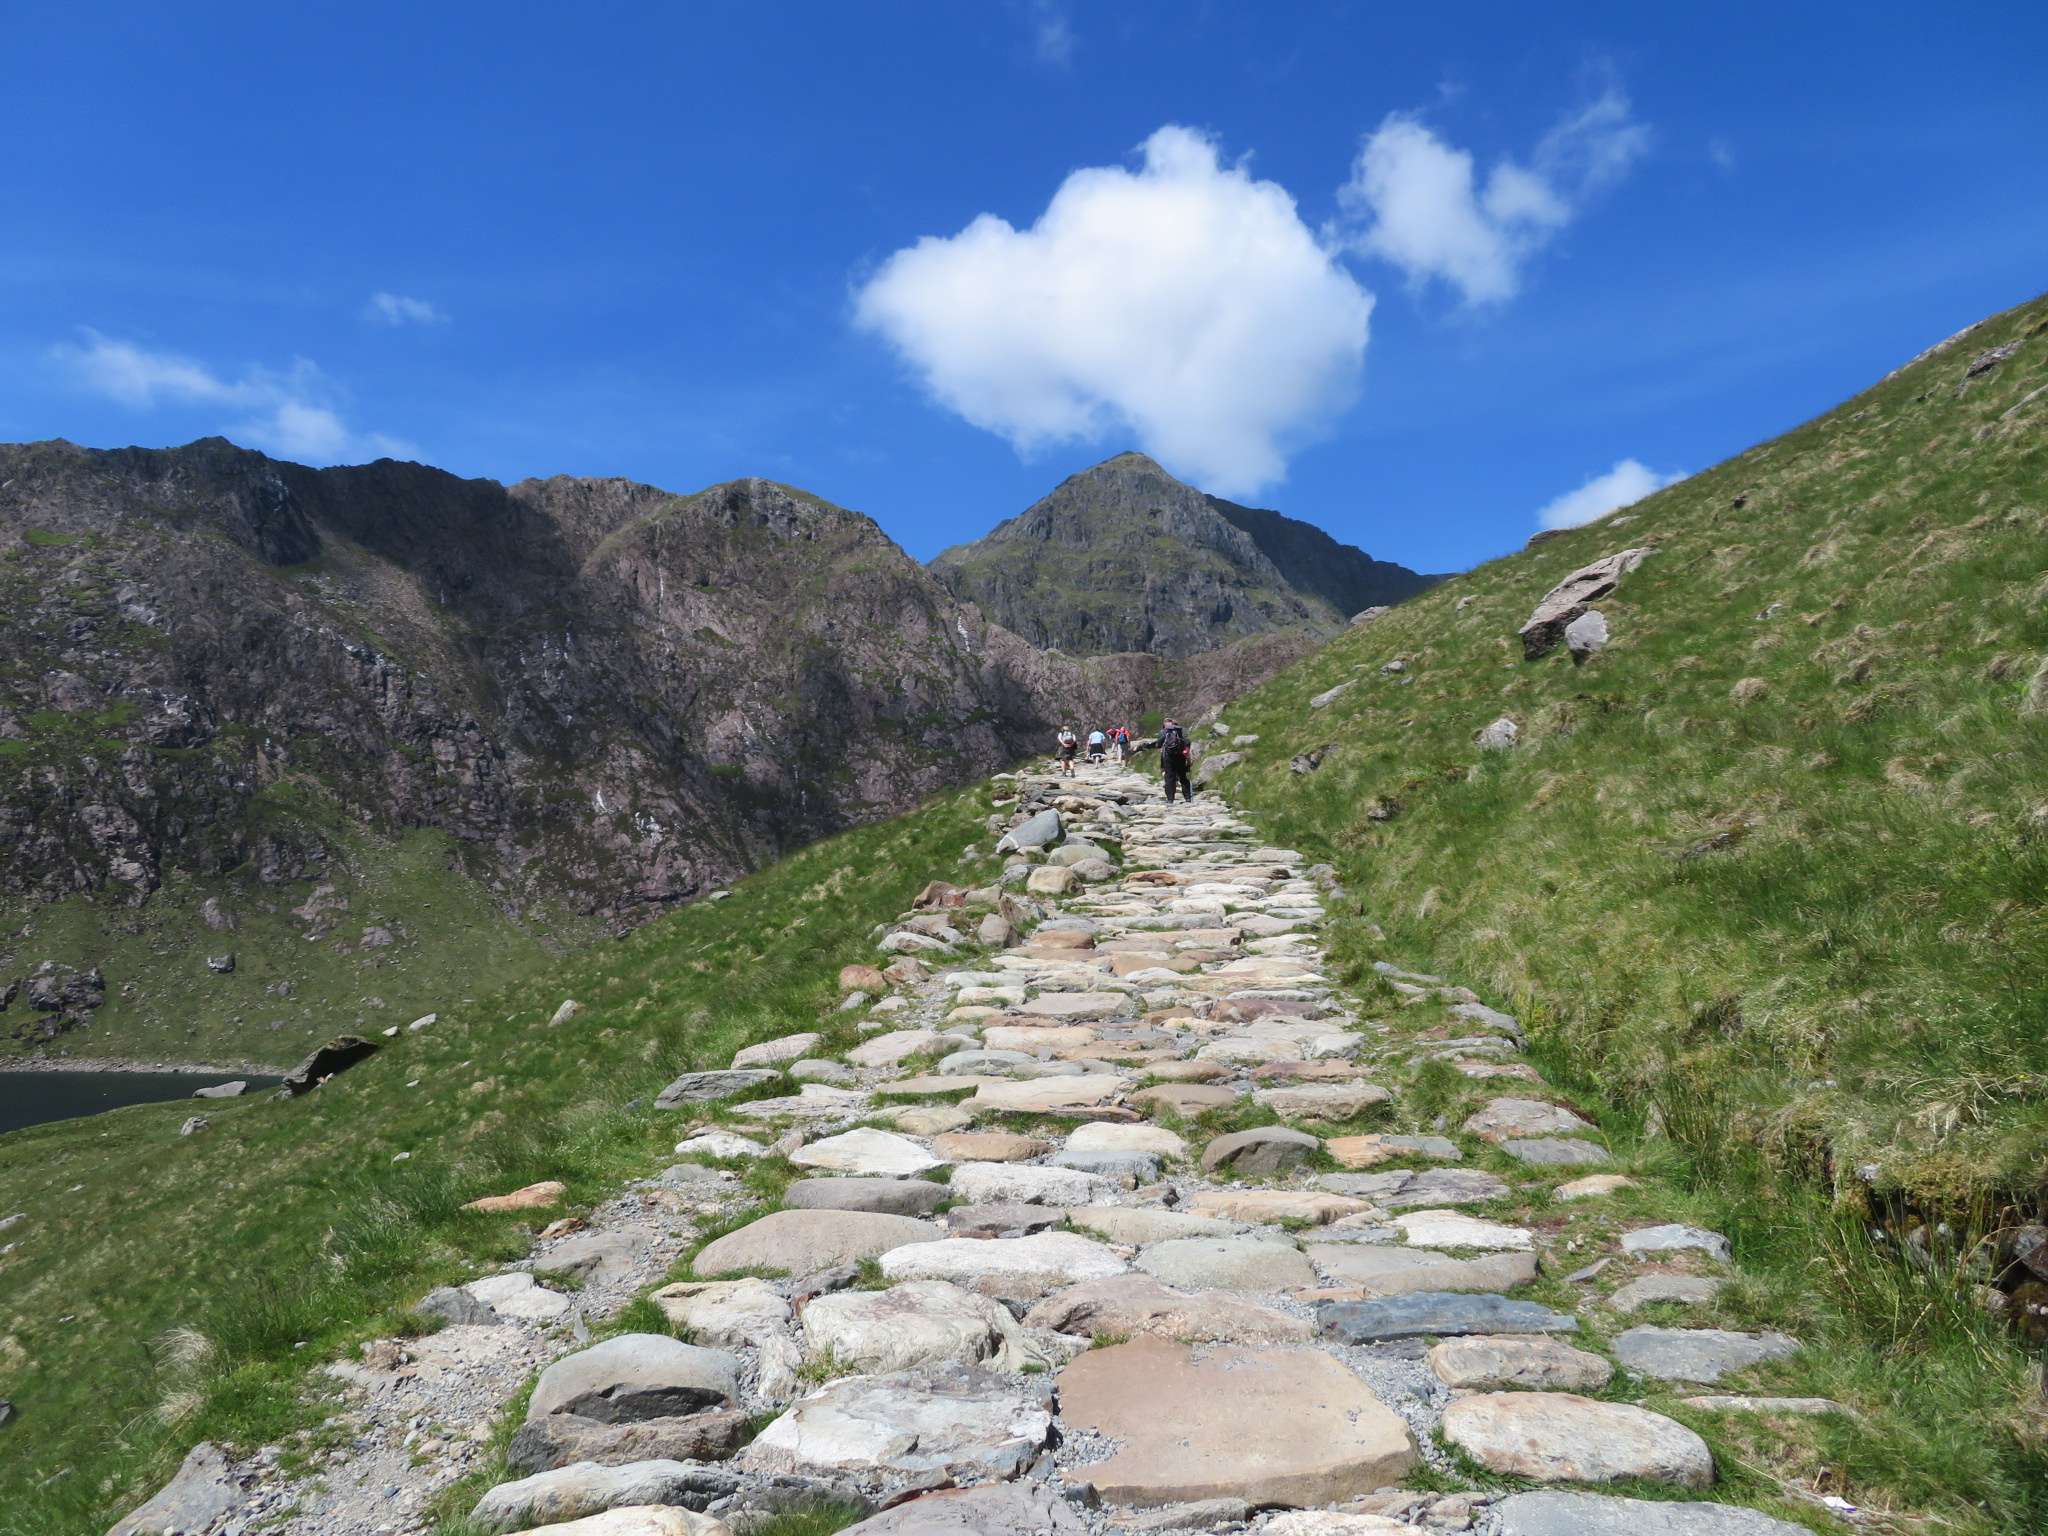 United Kingdom Wales Snowdonia, Snowdon Horseshoe, Miners Track, above LLyn LLydaw, Walkopedia